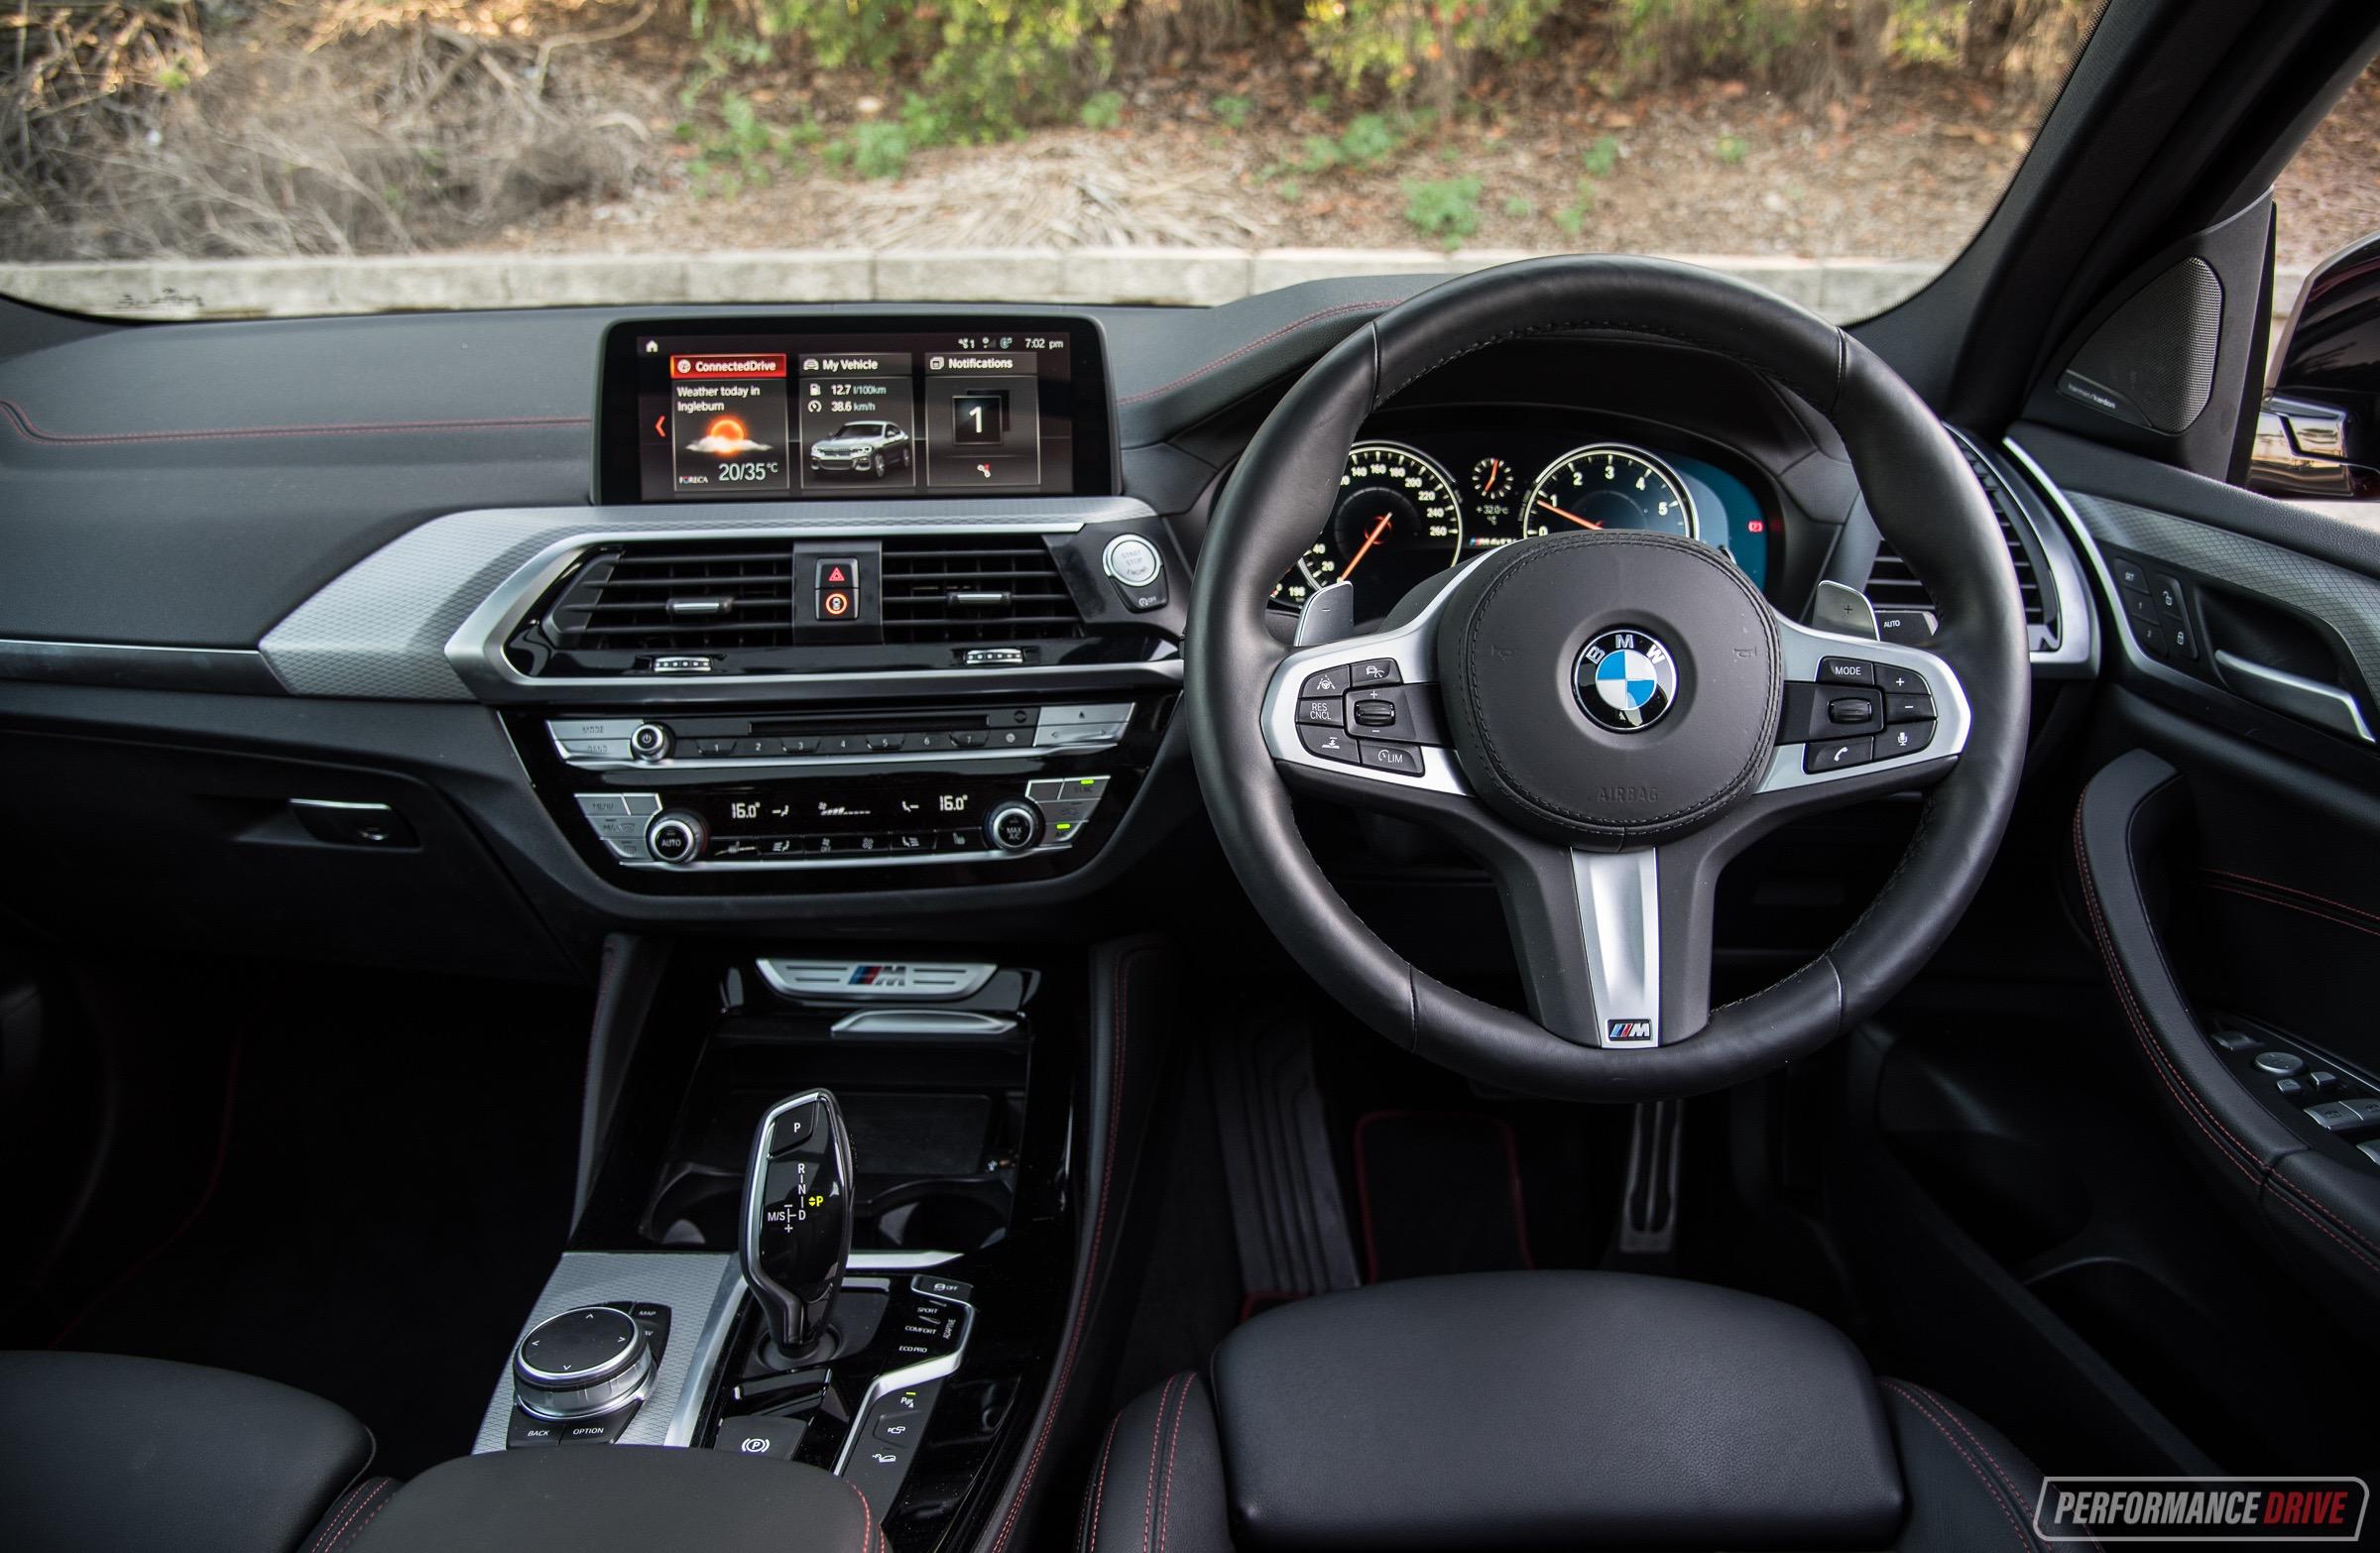 2019 Bmw X4 M40i Review Video Performancedrive